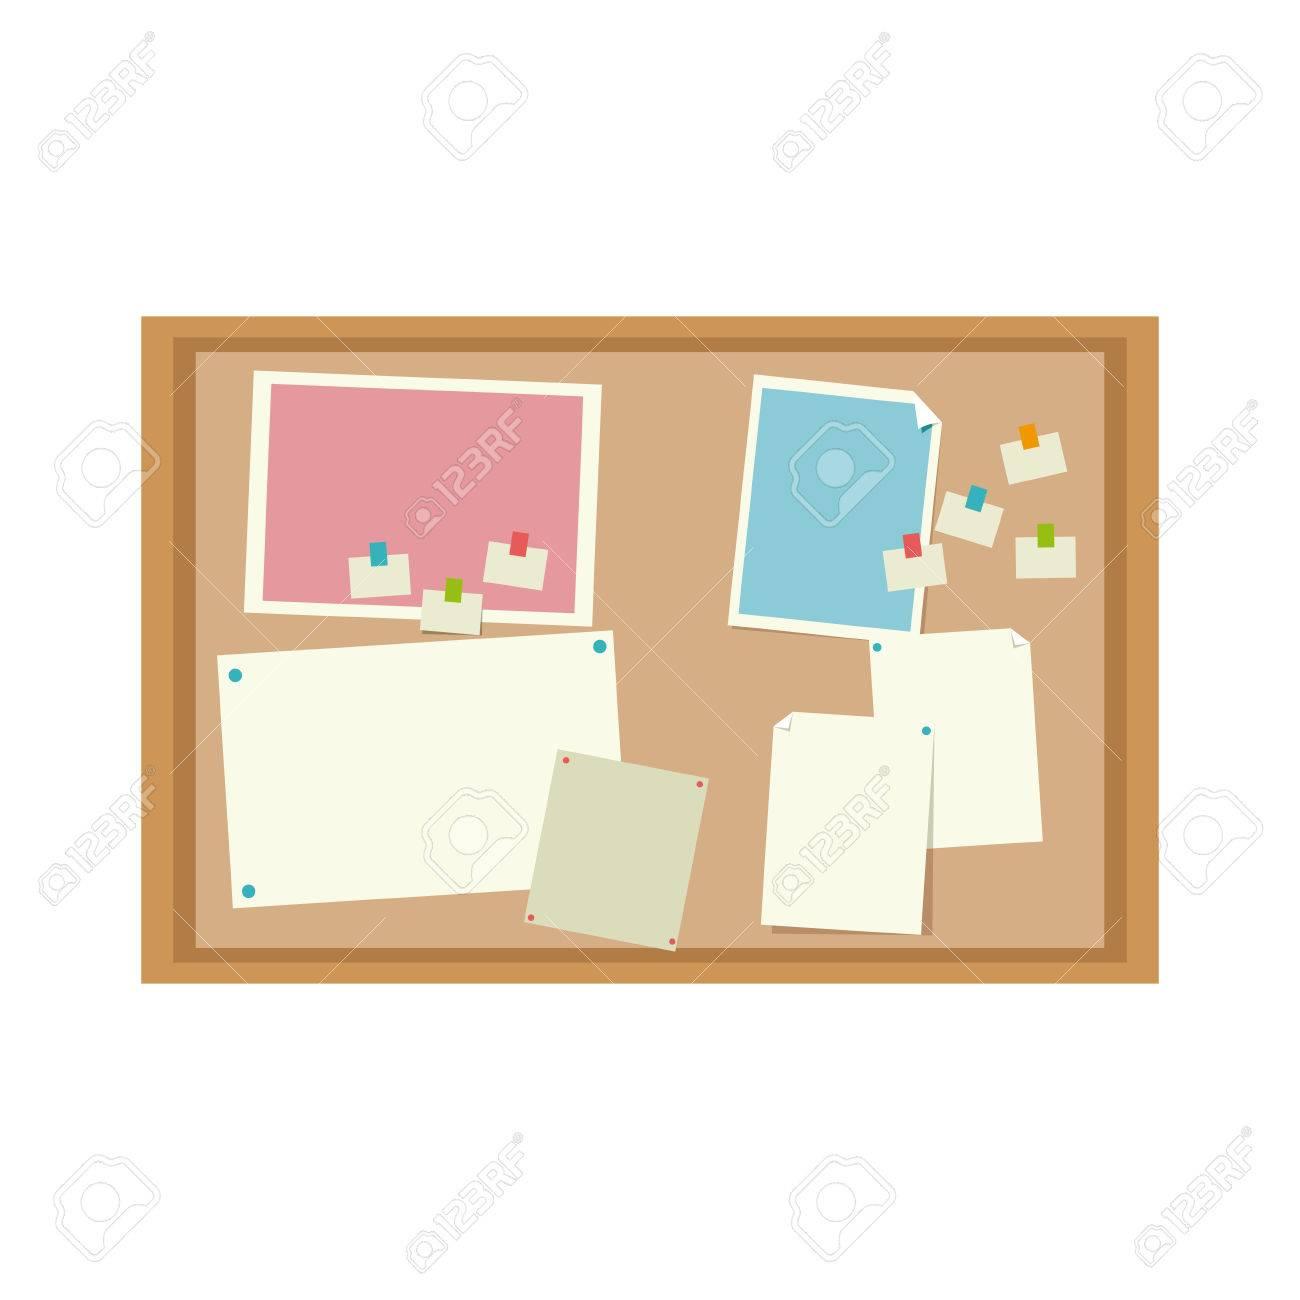 Kork Bord Mit Notizen Nachricht Büro Bild Vektor-Illustration ...